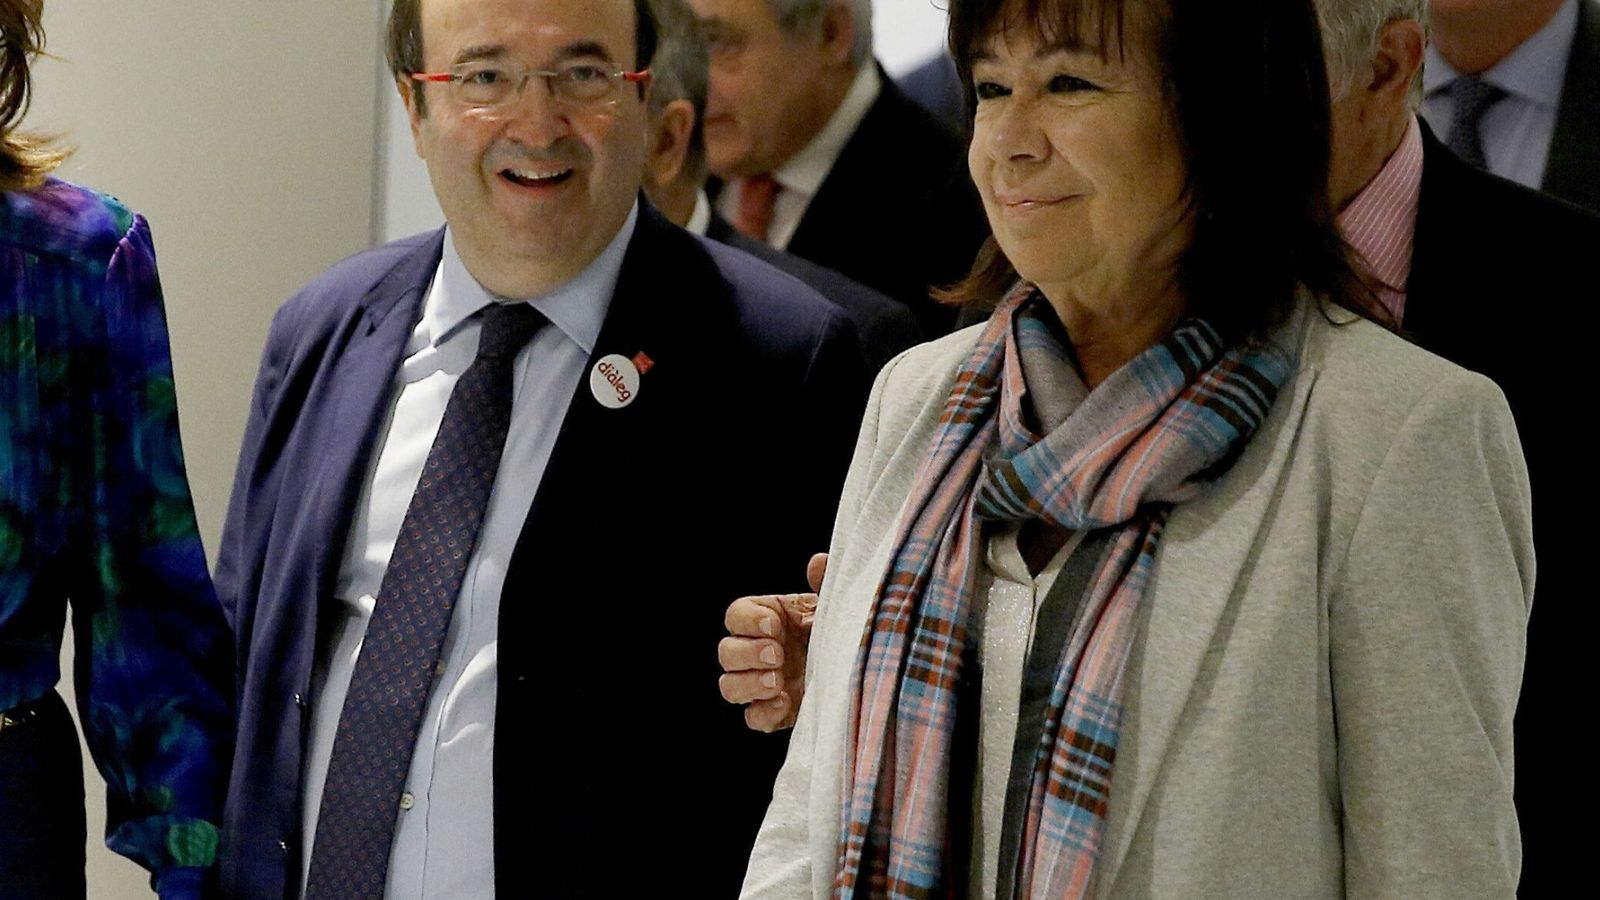 Foto: Miquel Iceta, a su llegada a la conferencia del Club Siglo XXI con Cristina Narbona, este 24 de octubre en Madrid. (EFE)